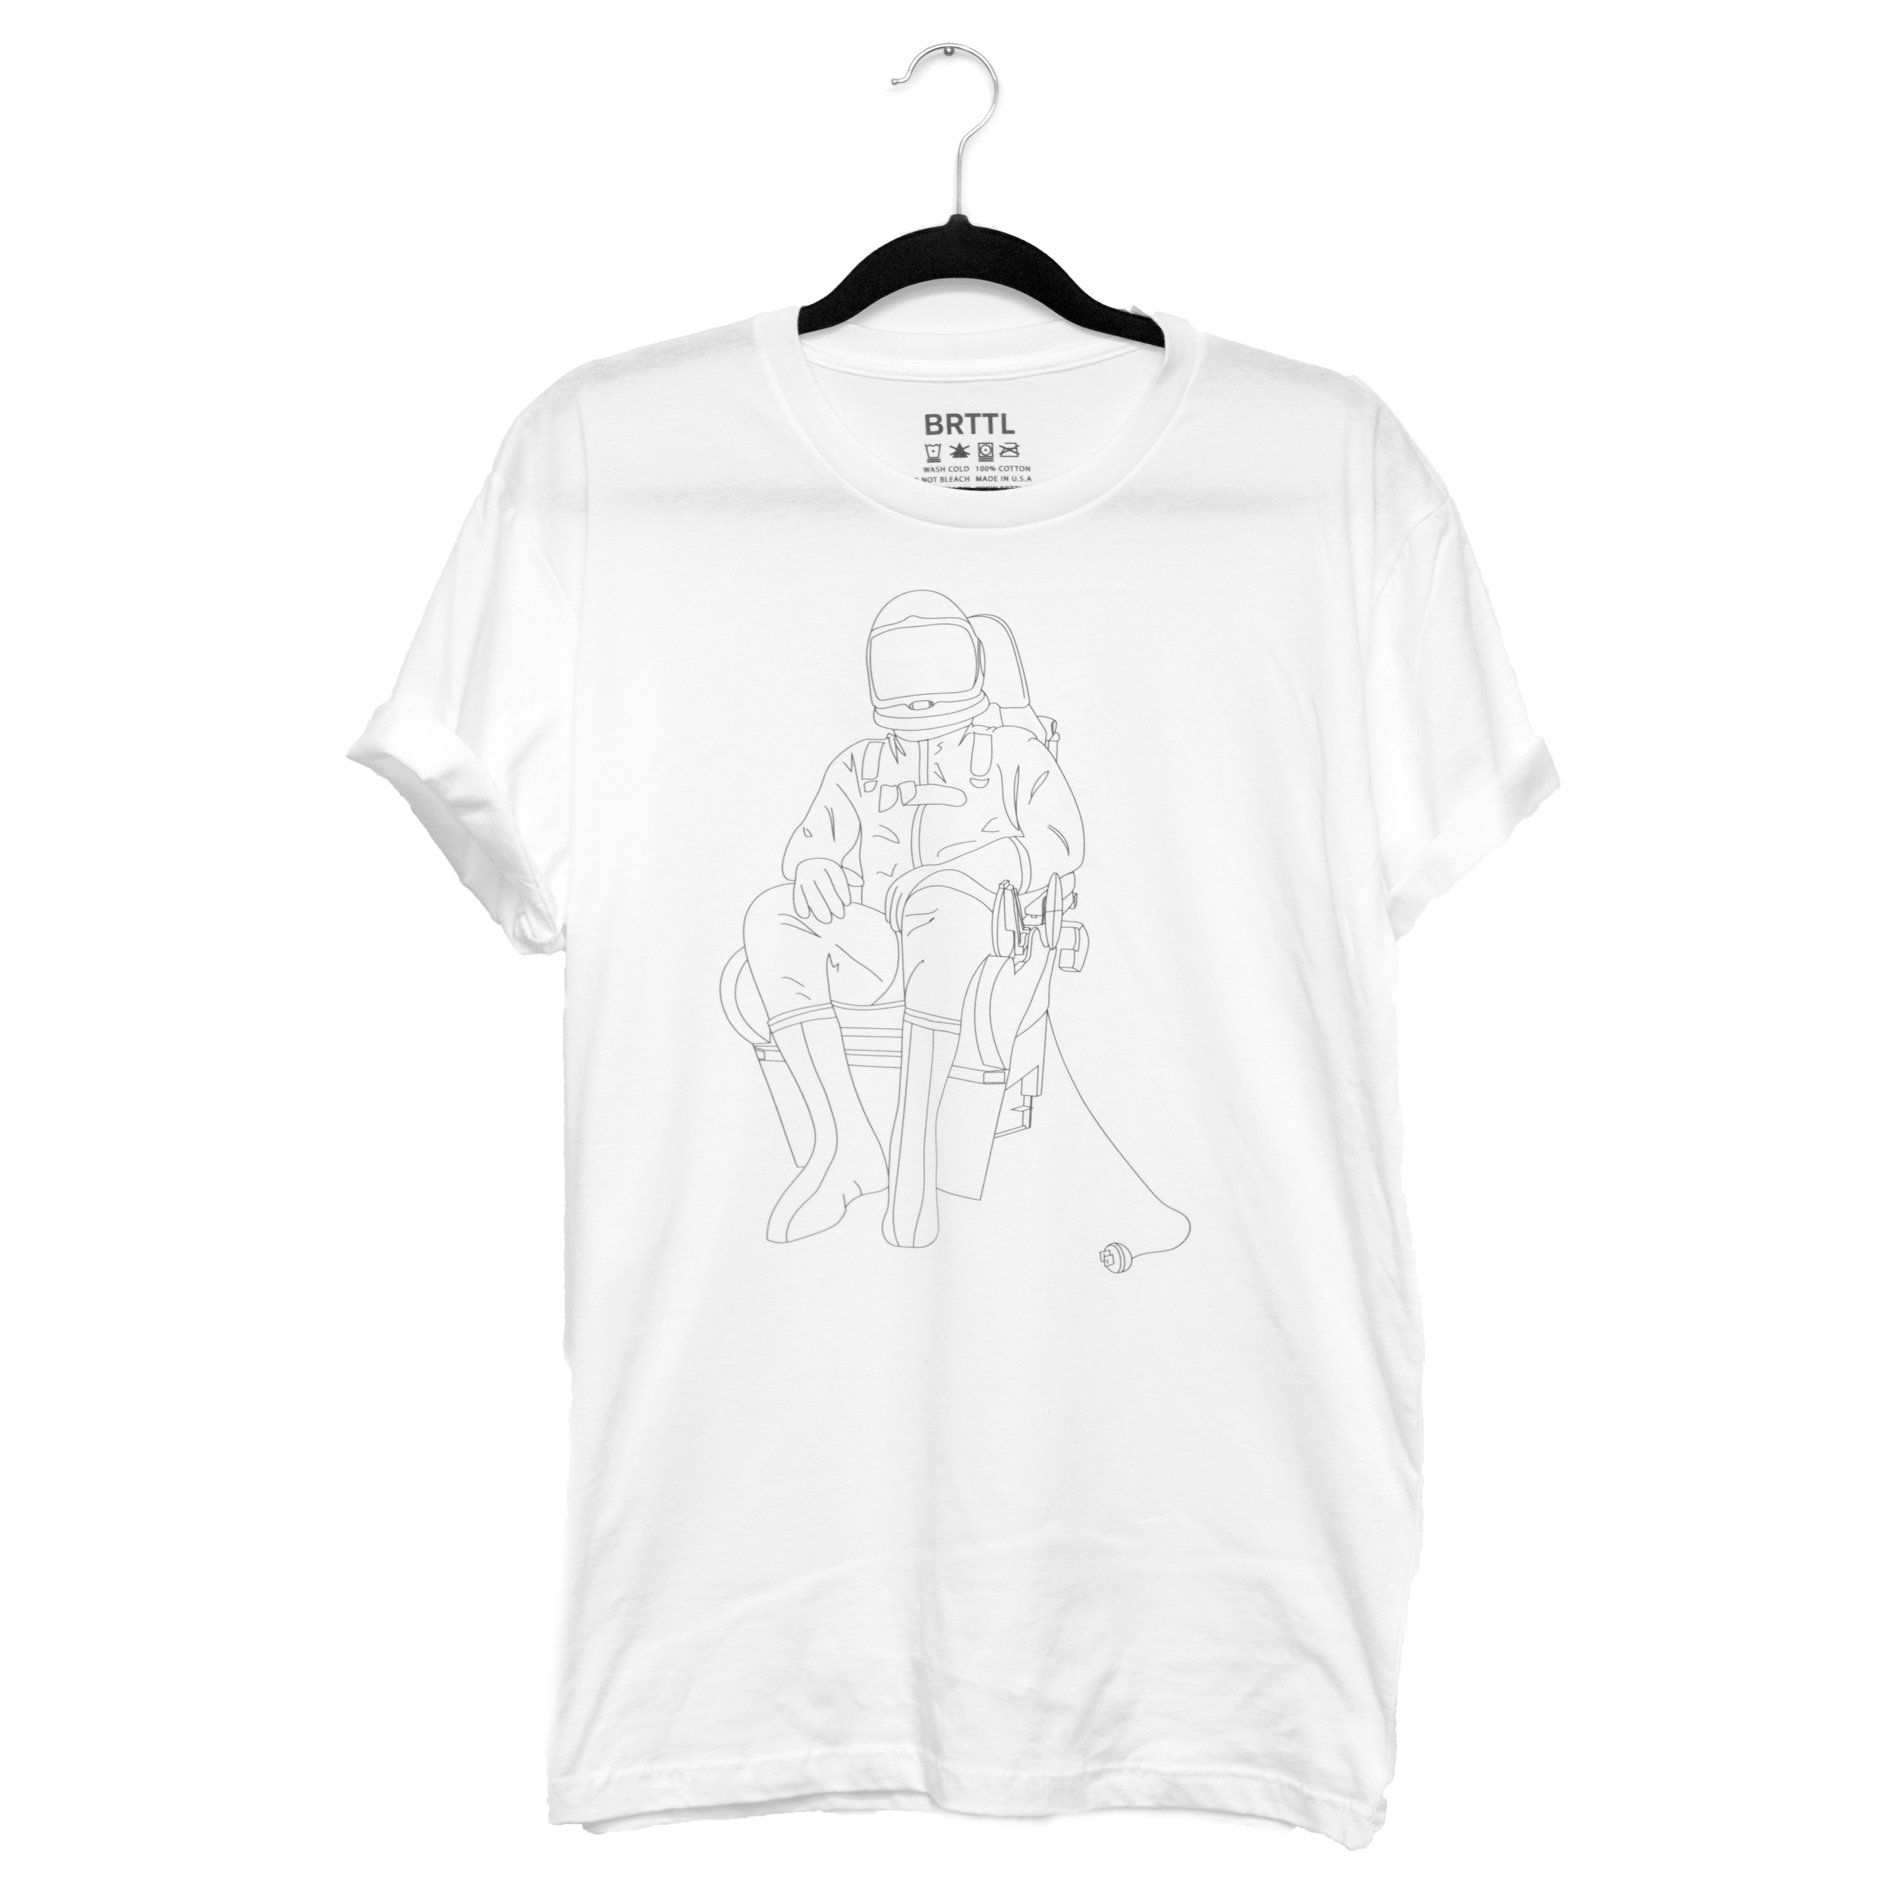 Space Astronaut T Shirt Line Drawing Streetwear Fashion Graphic Heart Printed Circuit Board Tshirts Unisex Triblend Tshirt Unplugged